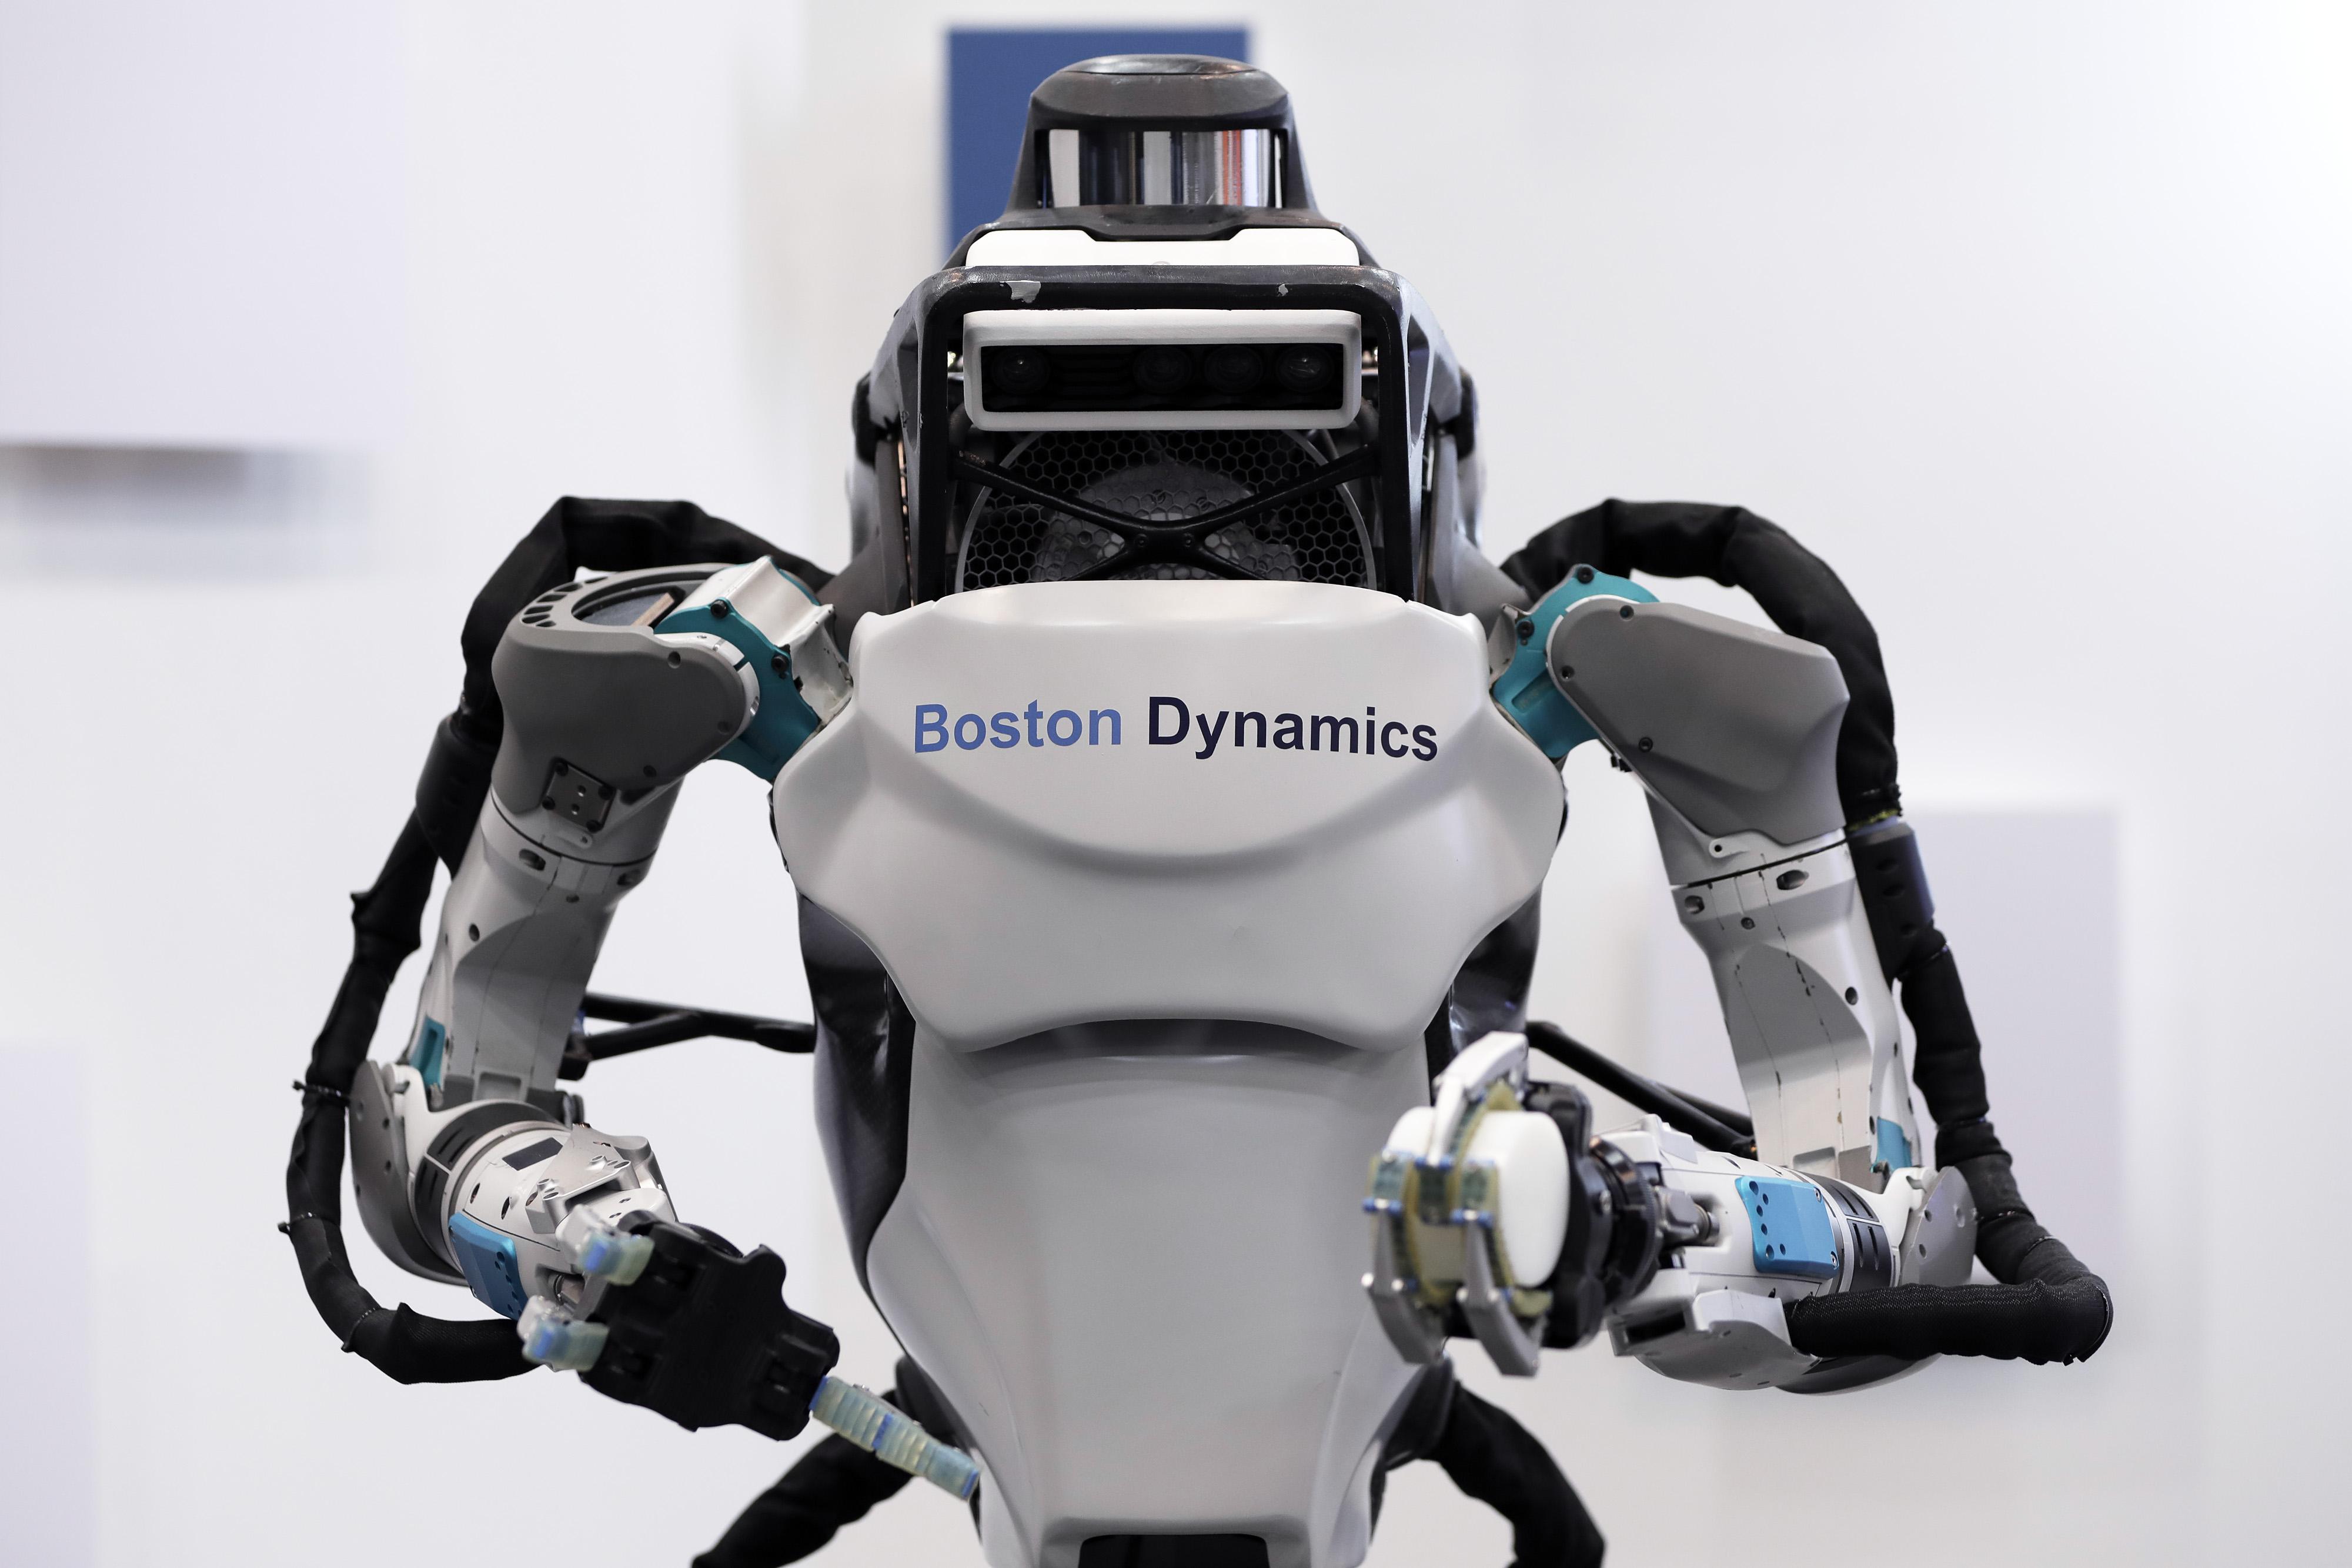 A Boston Dynamics Inc. Atlas humanoid robot is displayed at the SoftBank Robot World 2017 in Tokyo, Japan, on Nov. 21, 2017.